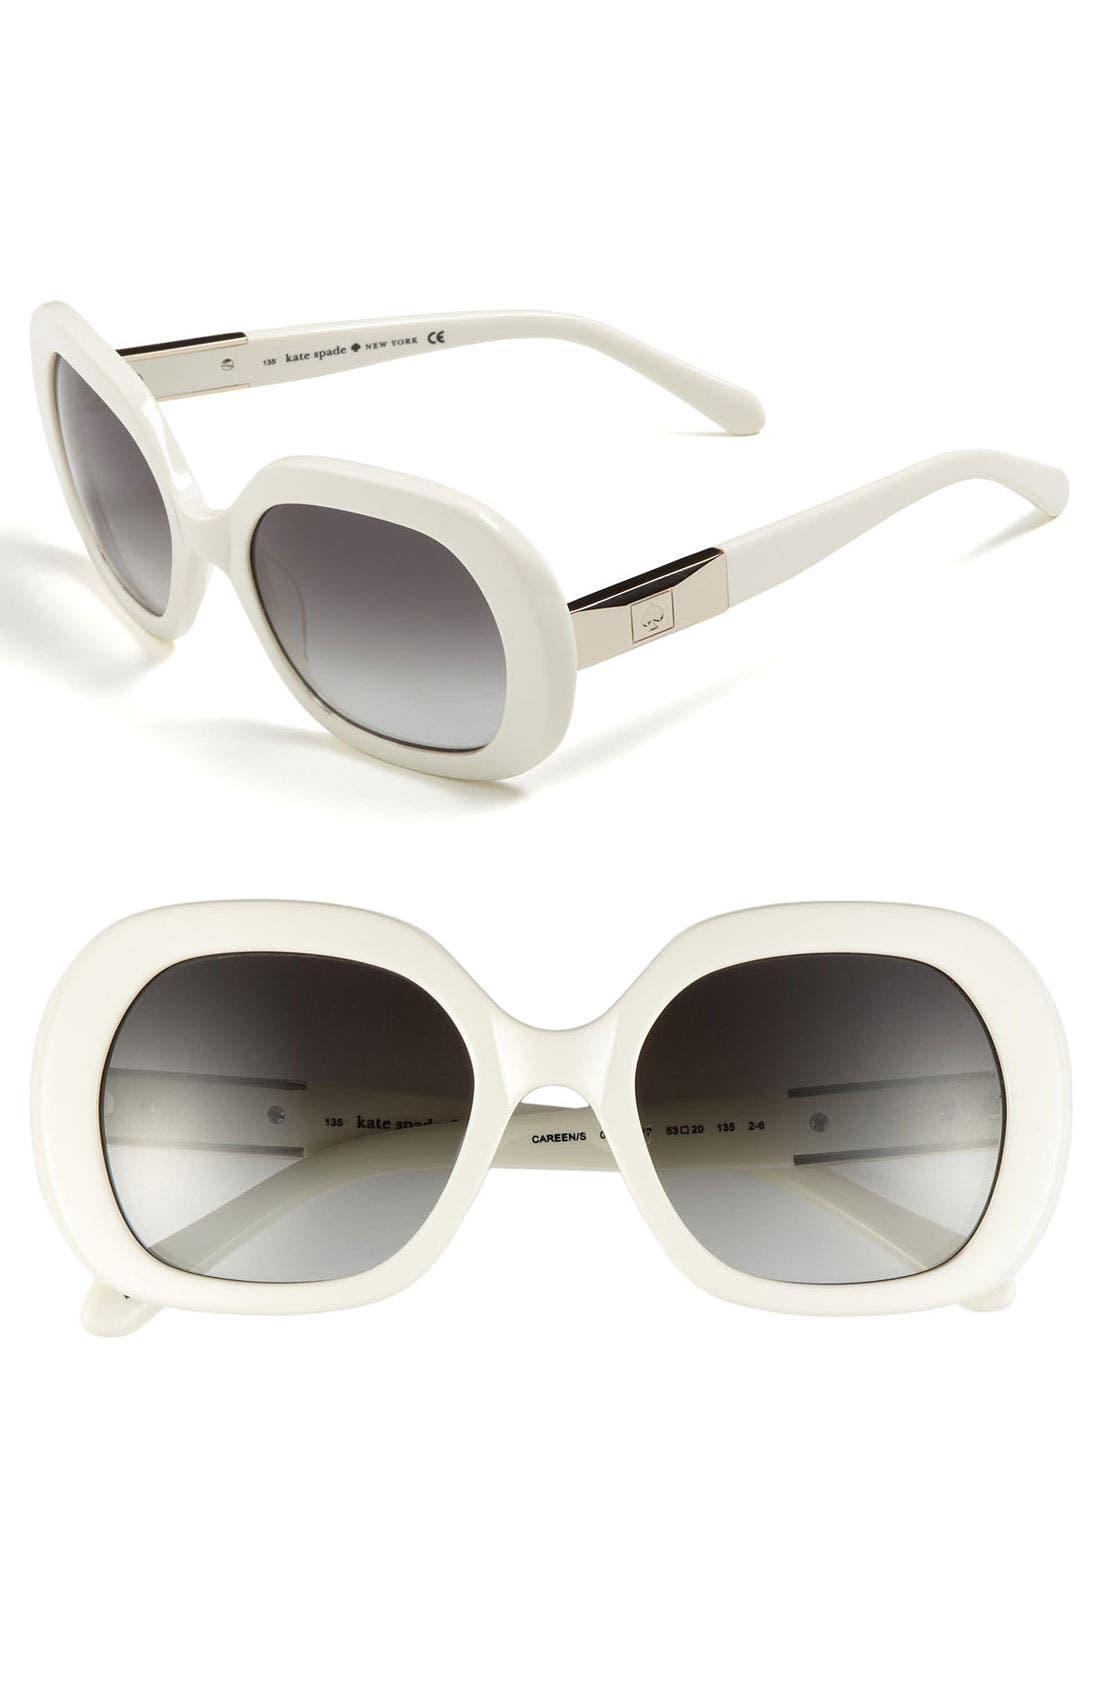 Alternate Image 1 Selected - kate spade new york 'careen' 53mm sunglasses